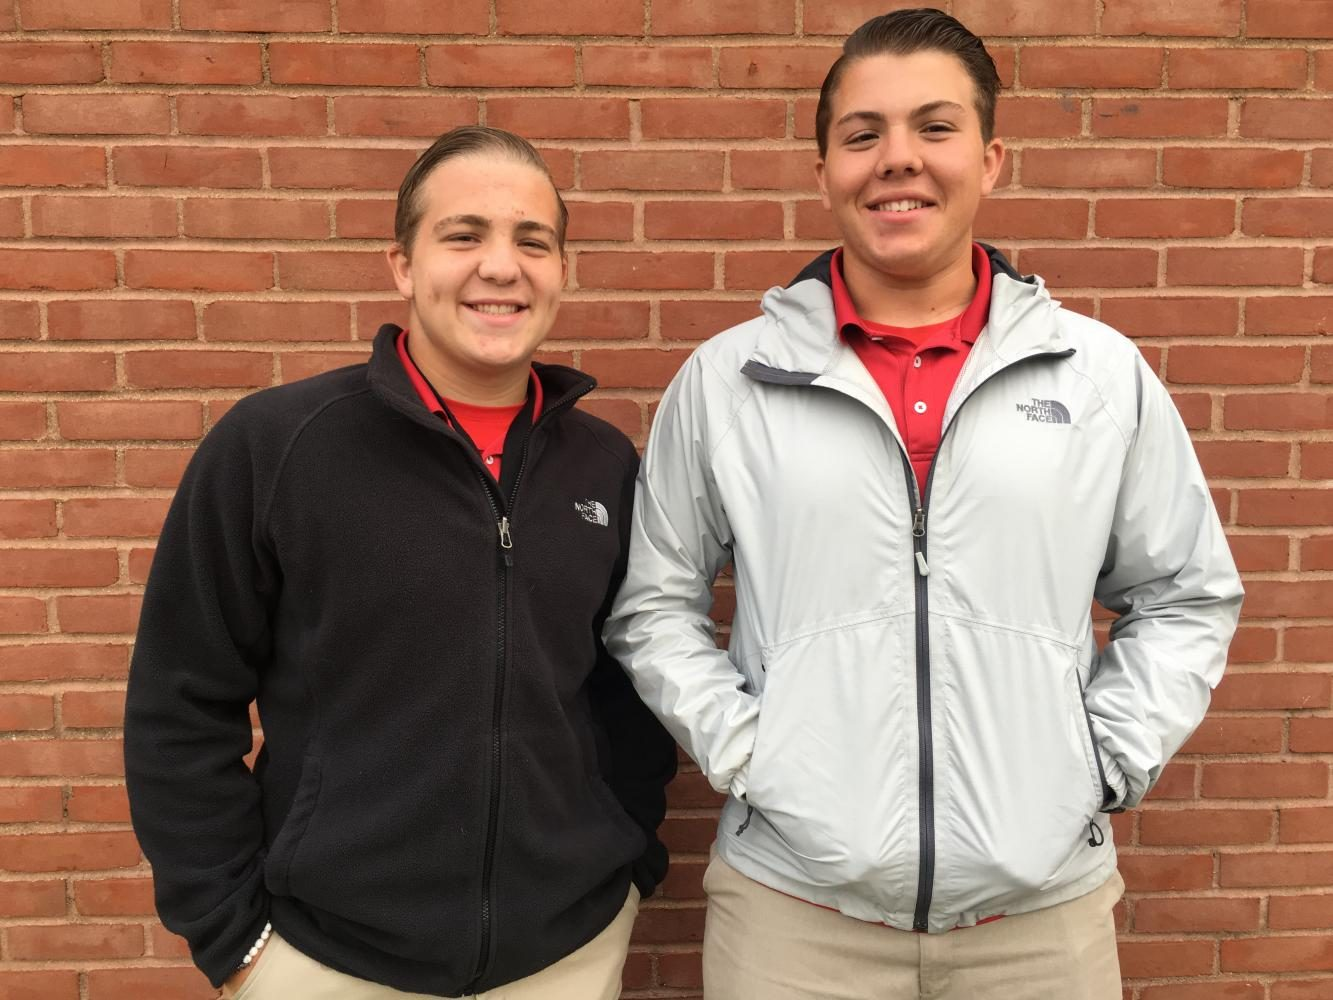 Luke and Logan Dilley